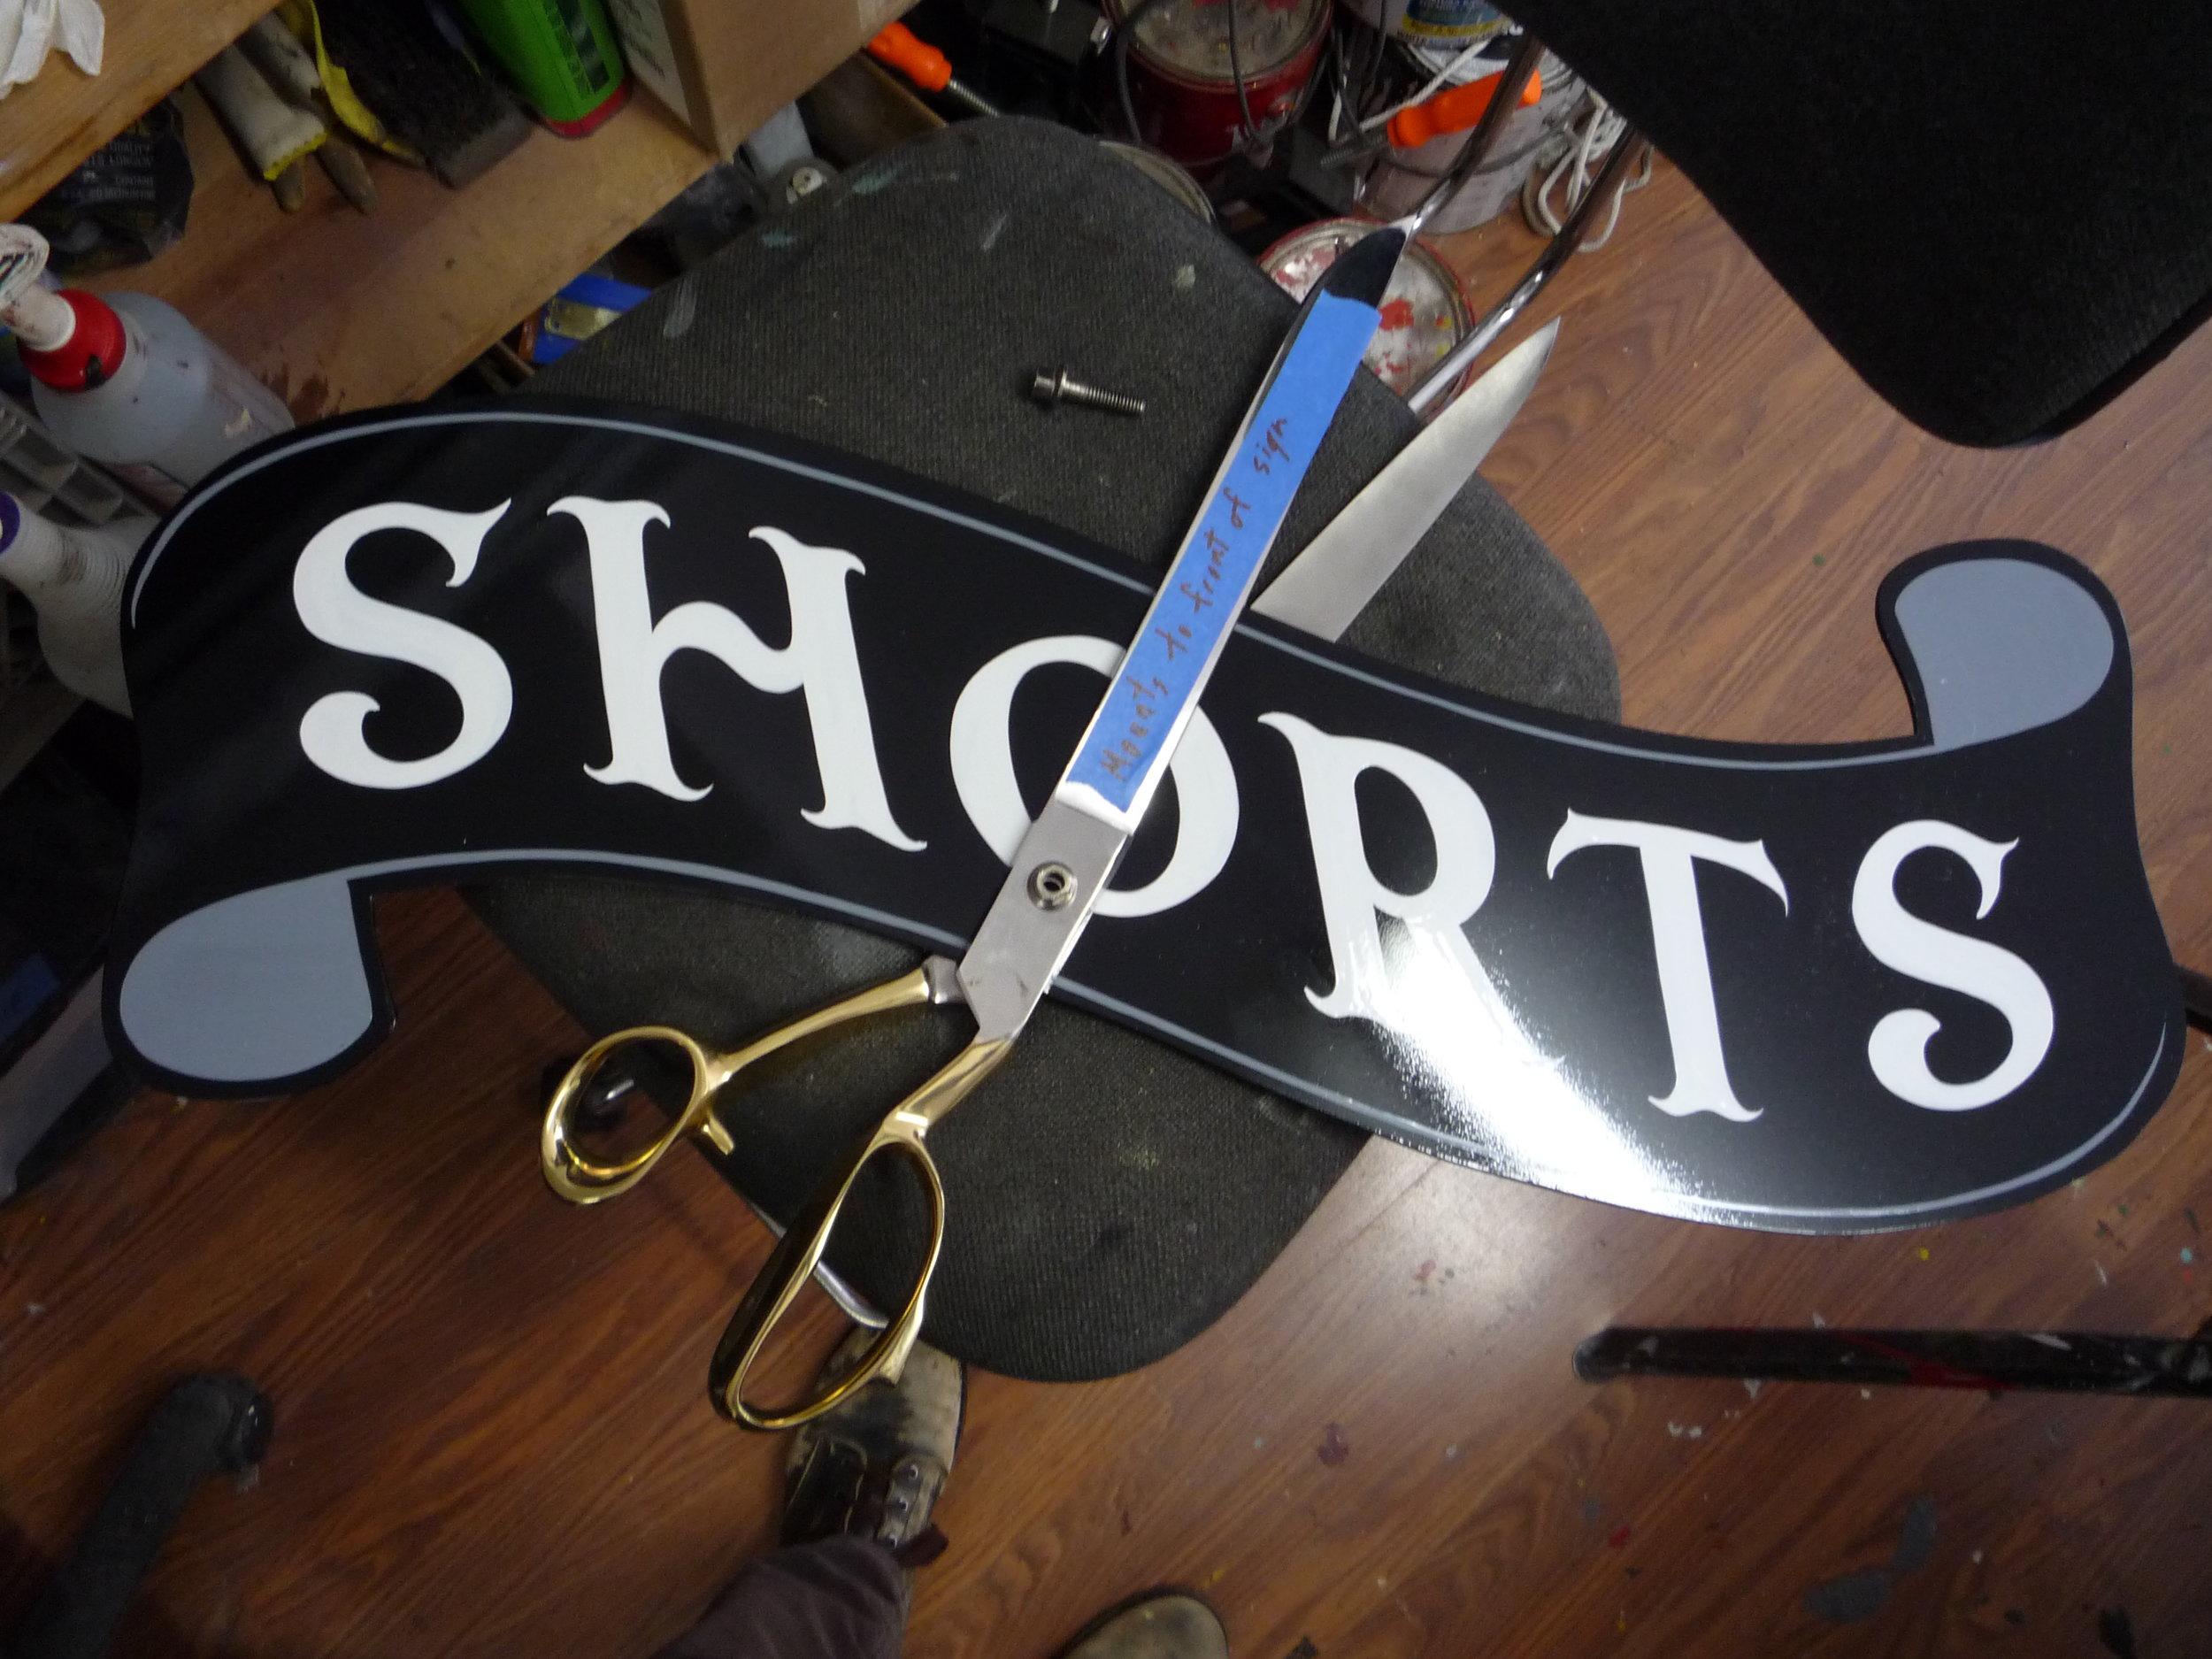 ORIG-shorts_4747647316_o.jpg